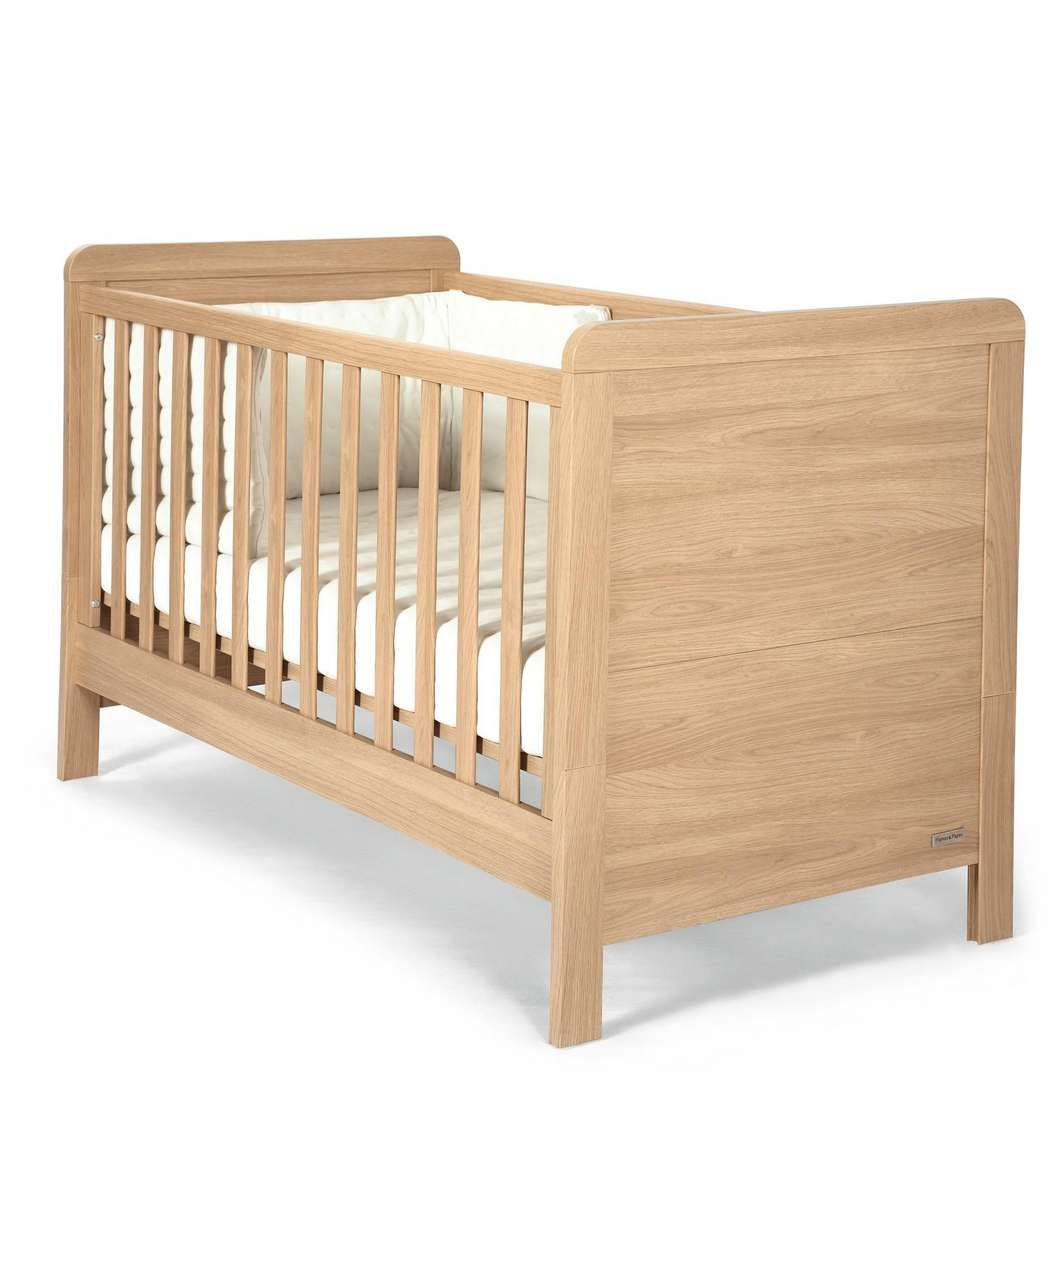 Rialto Cot Toddler Bed